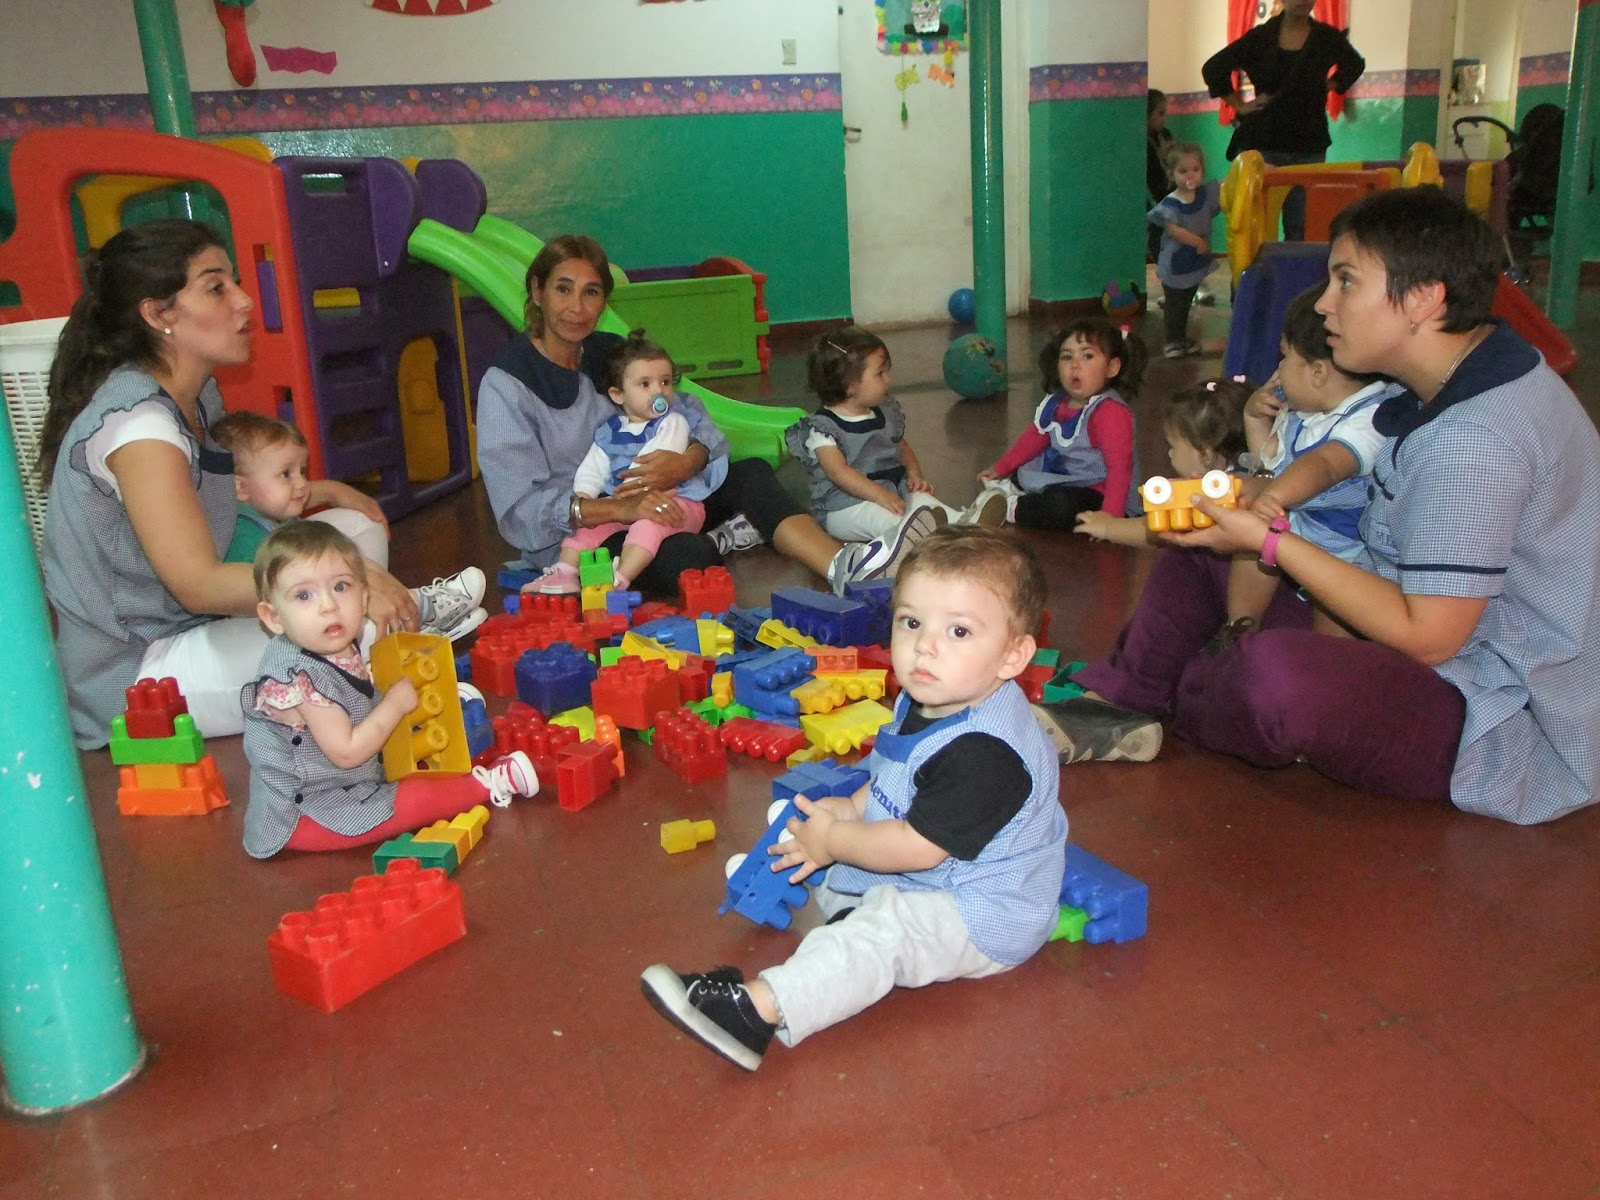 Jard n maternal arco iris 27 a os al servicio de la for Actividades para jardin maternal sala de 2